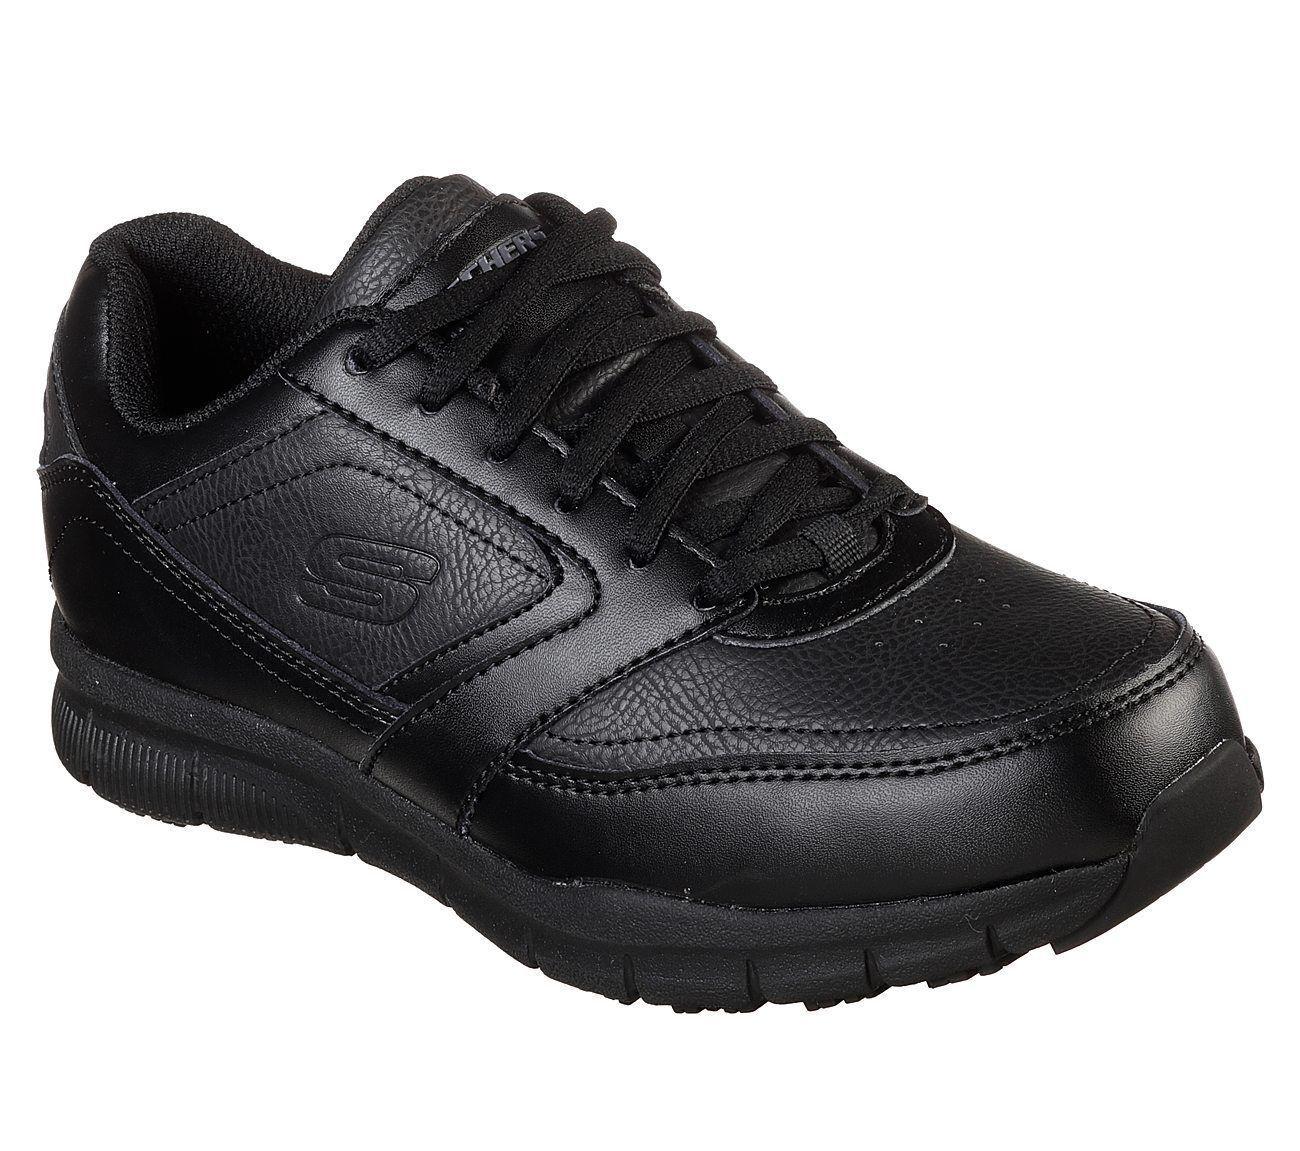 Work Black Skechers shoes Women 77235 Memory Memory Memory Foam Slip Resistant Electrical Safe bc87a0